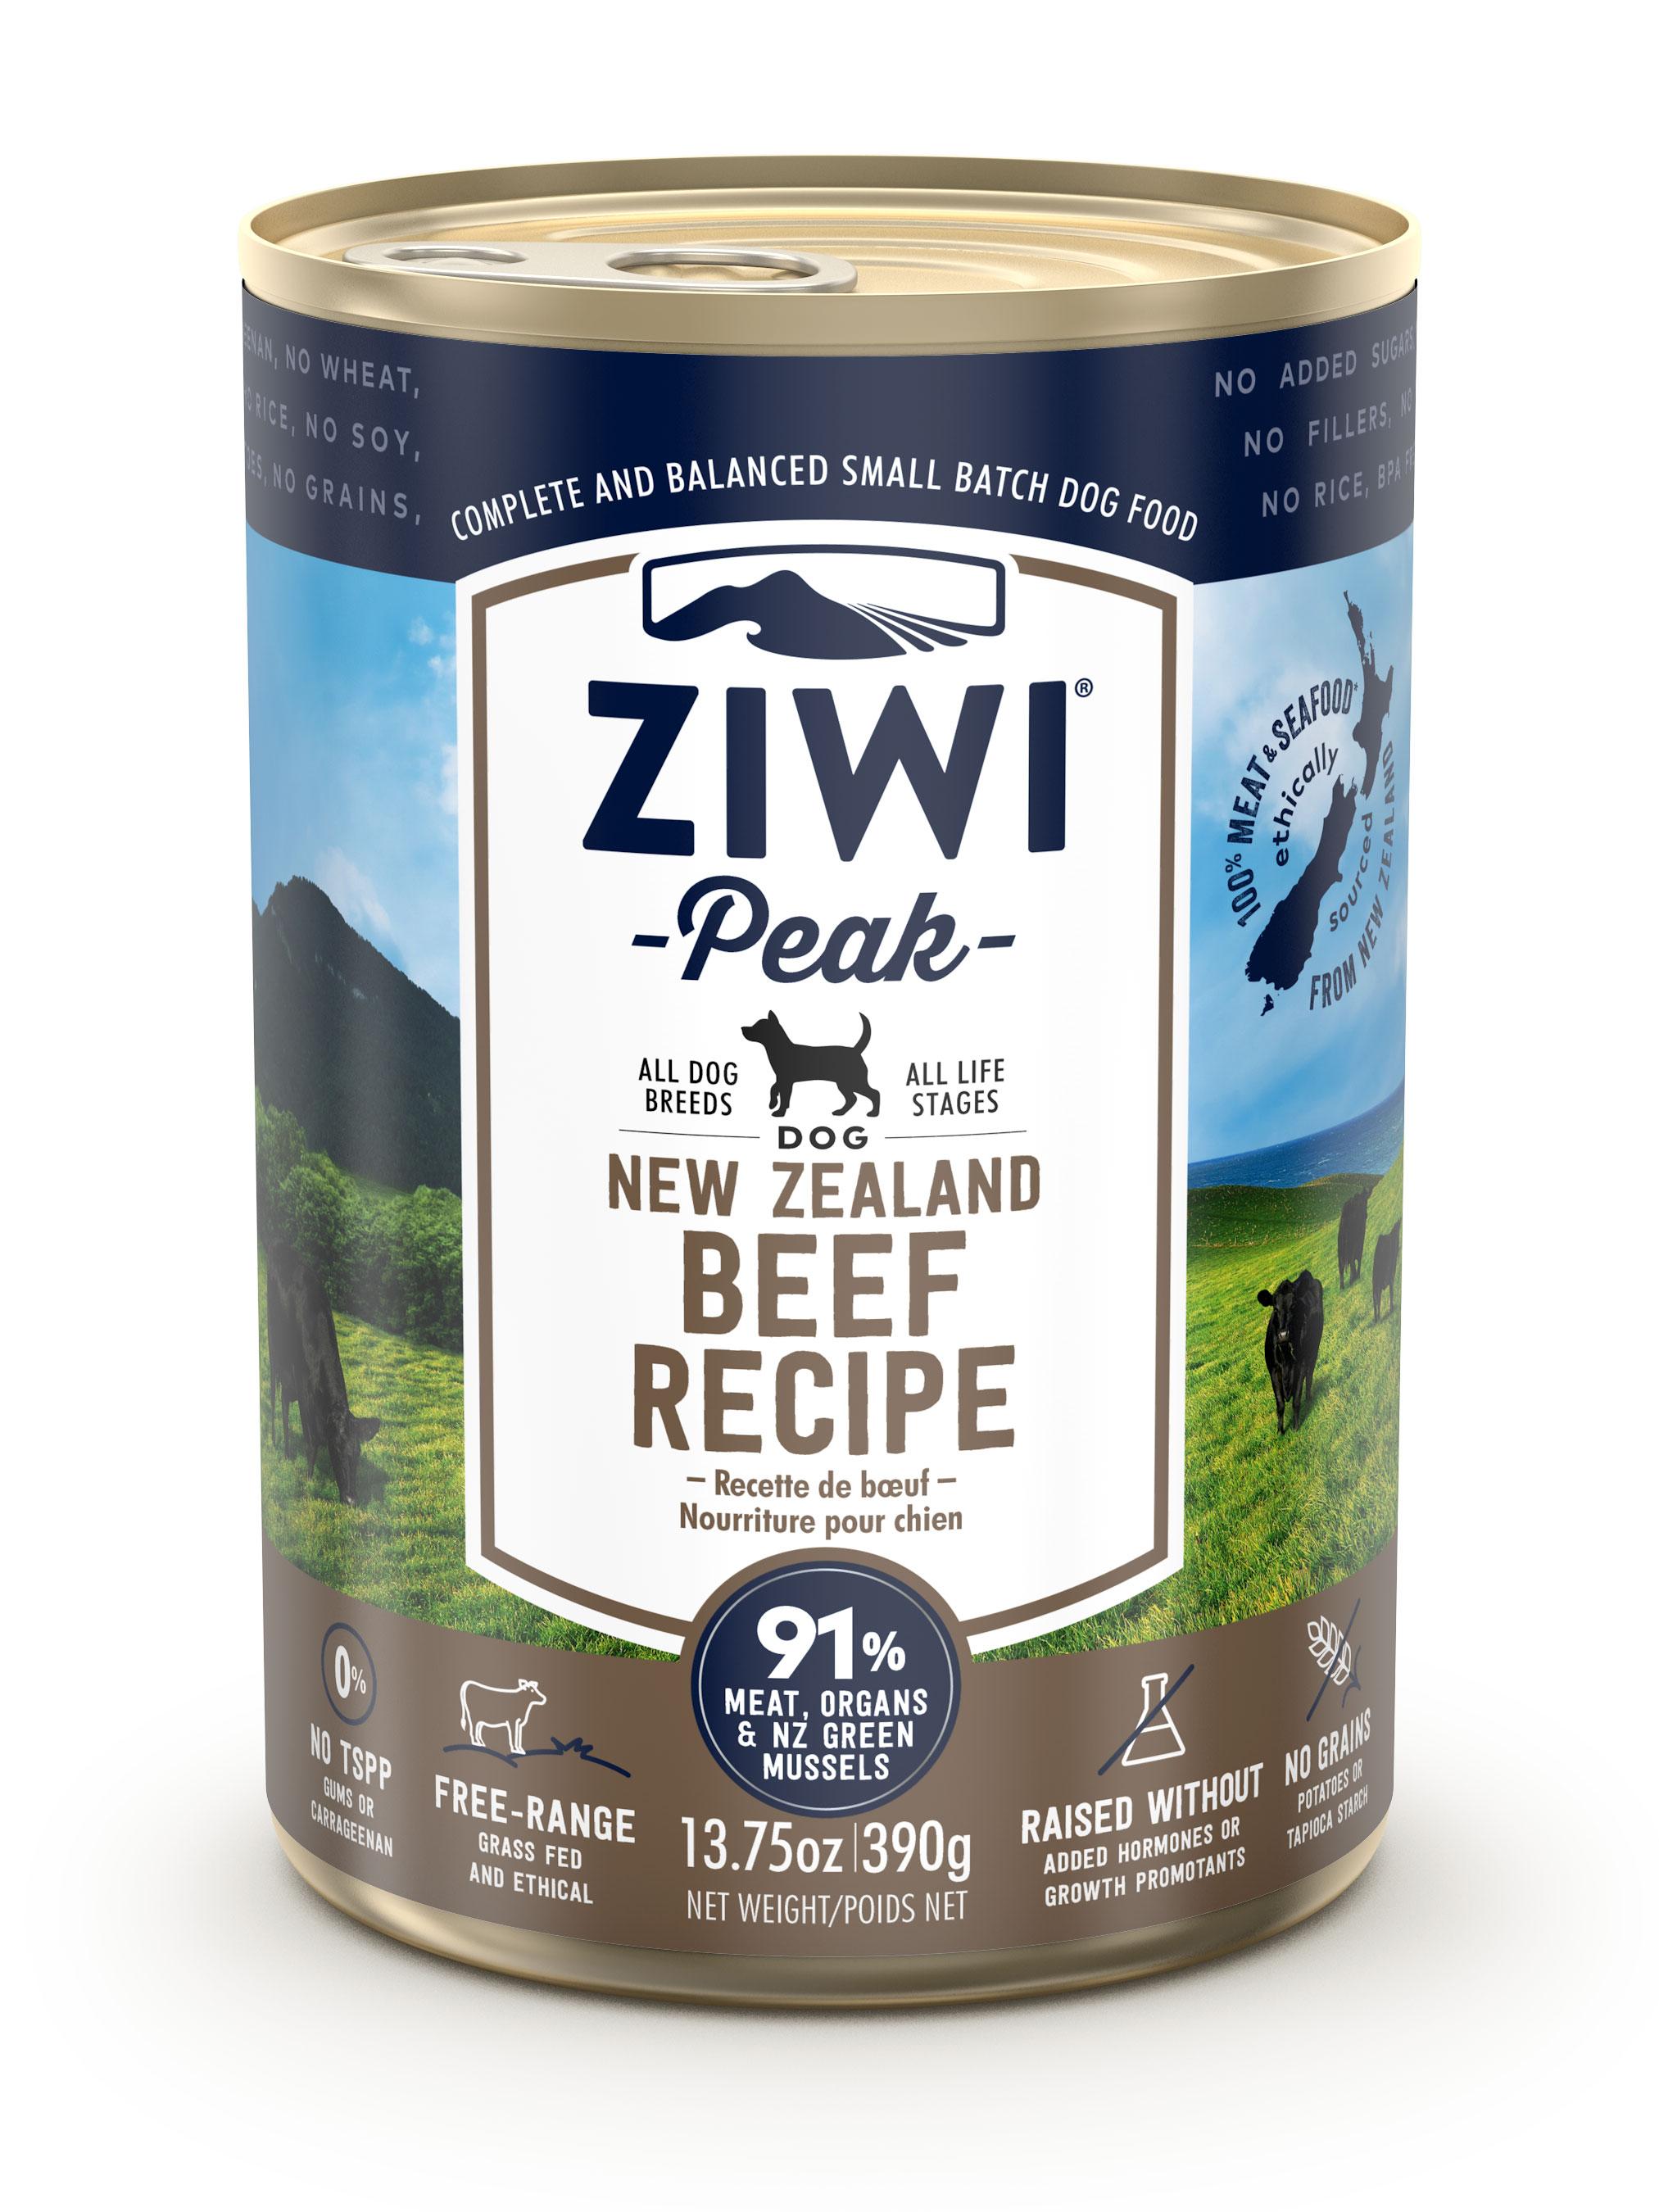 ZIWI Peak Canned Dog Food Beef Recipe, 13.75-oz|390-g